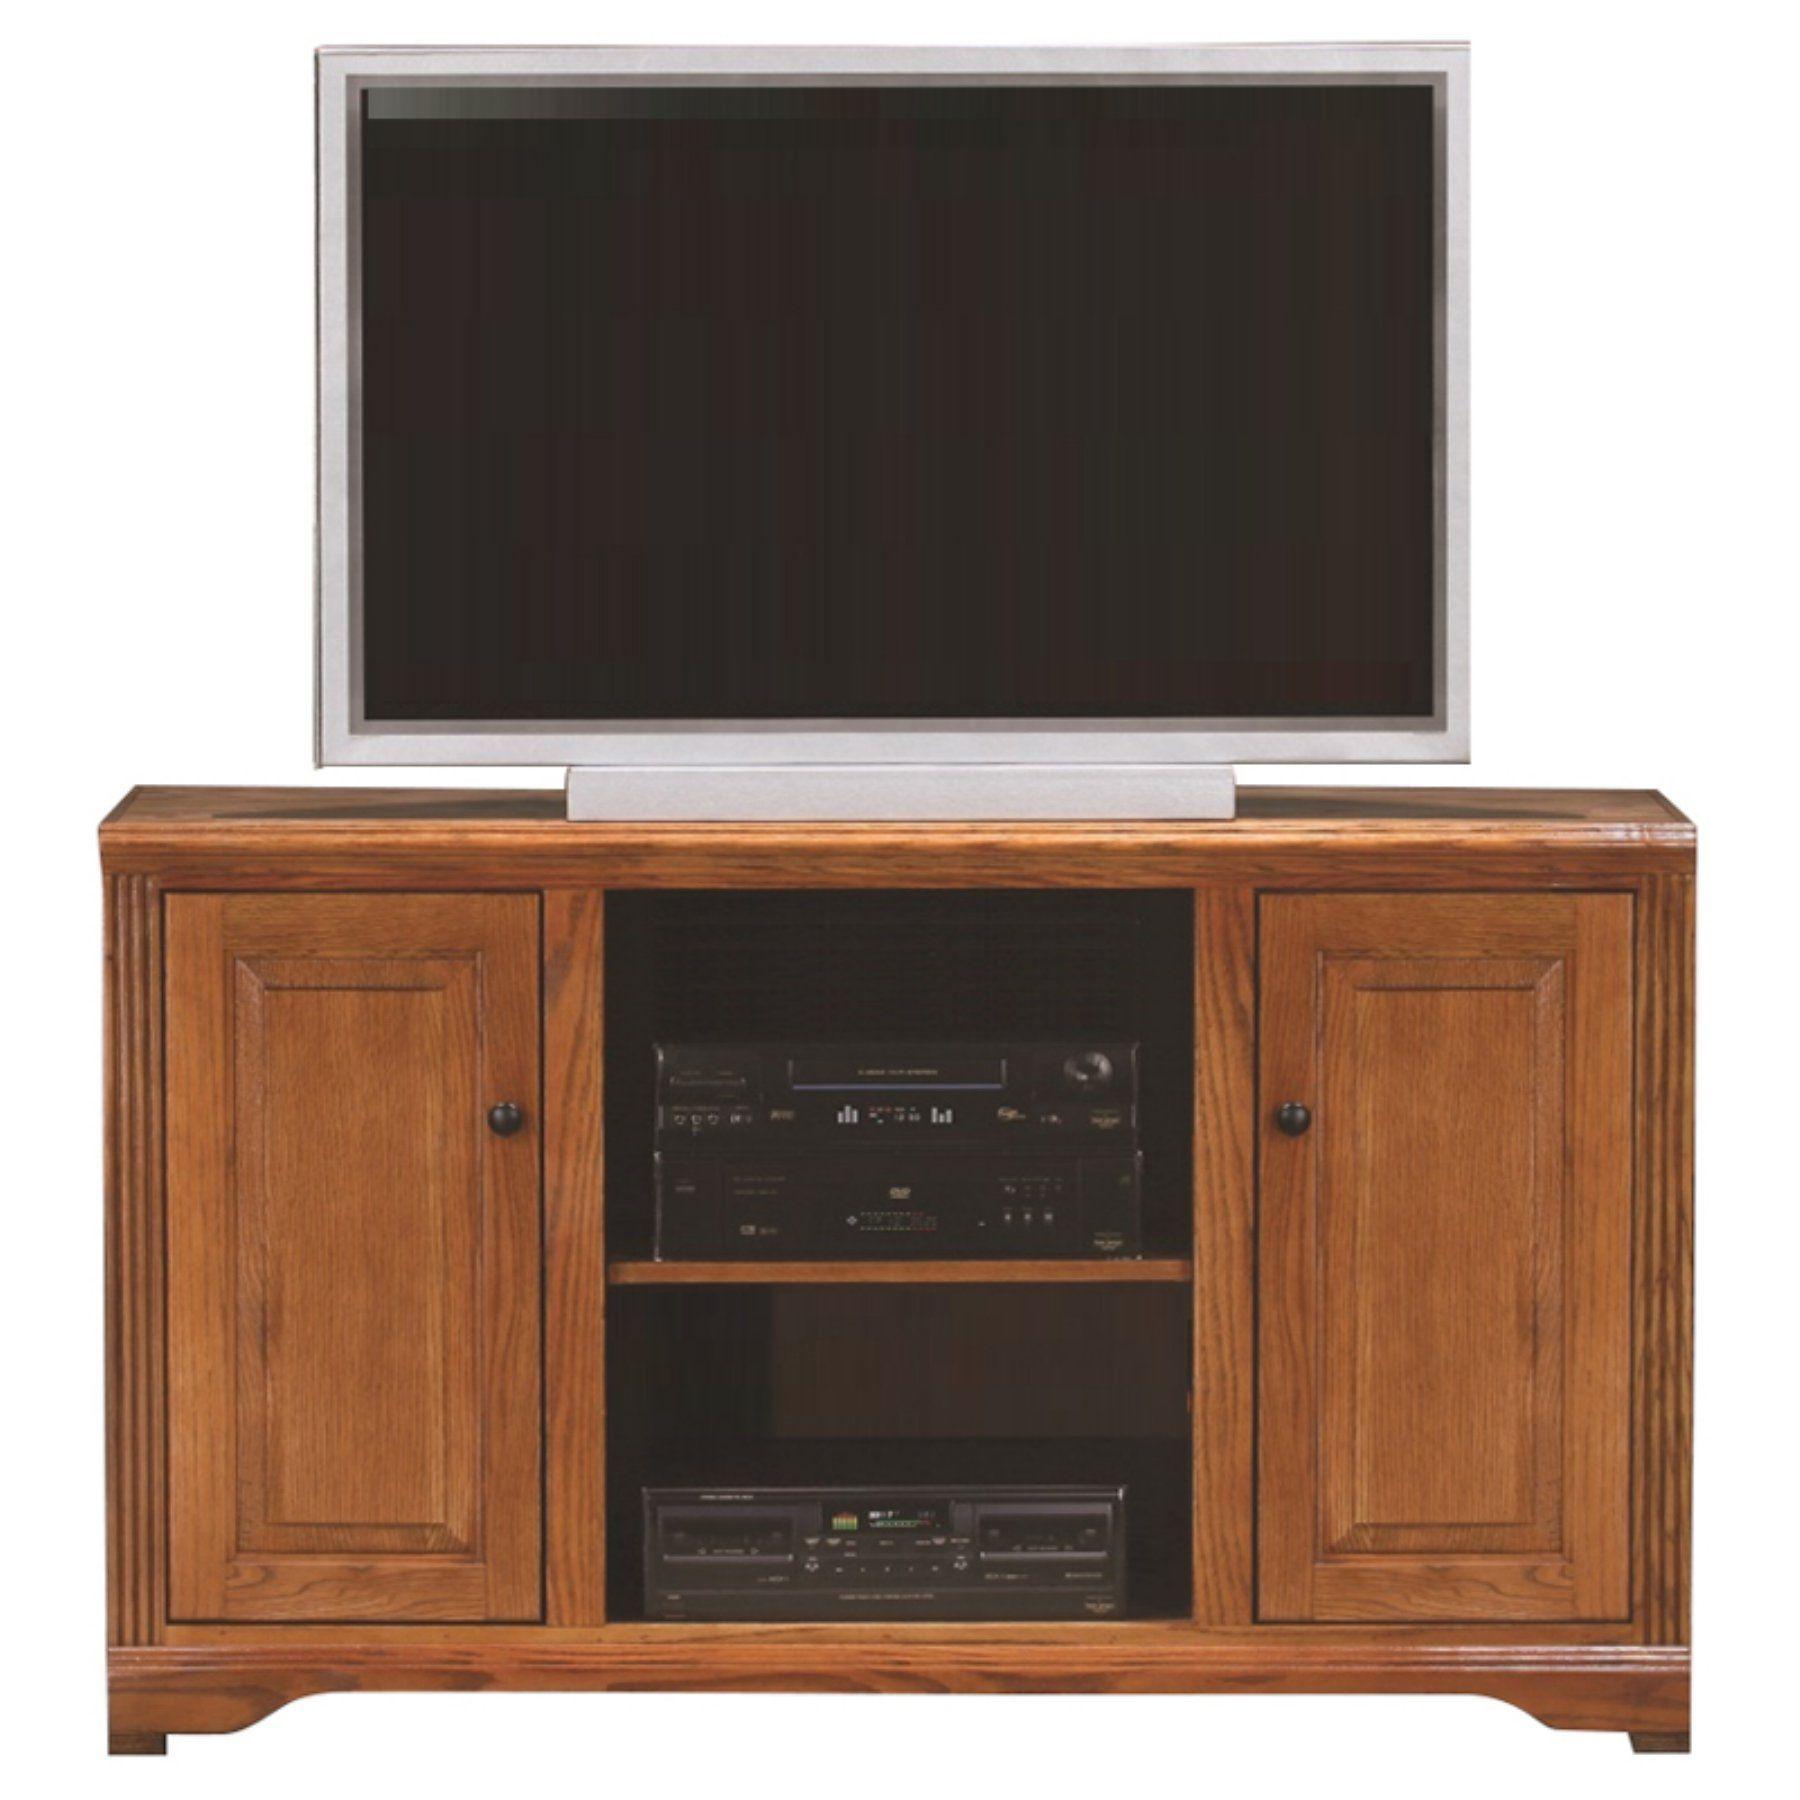 Eagle Furniture Oak Ridge 55 in. Thin-Screen TV Stand - 93557WPDK